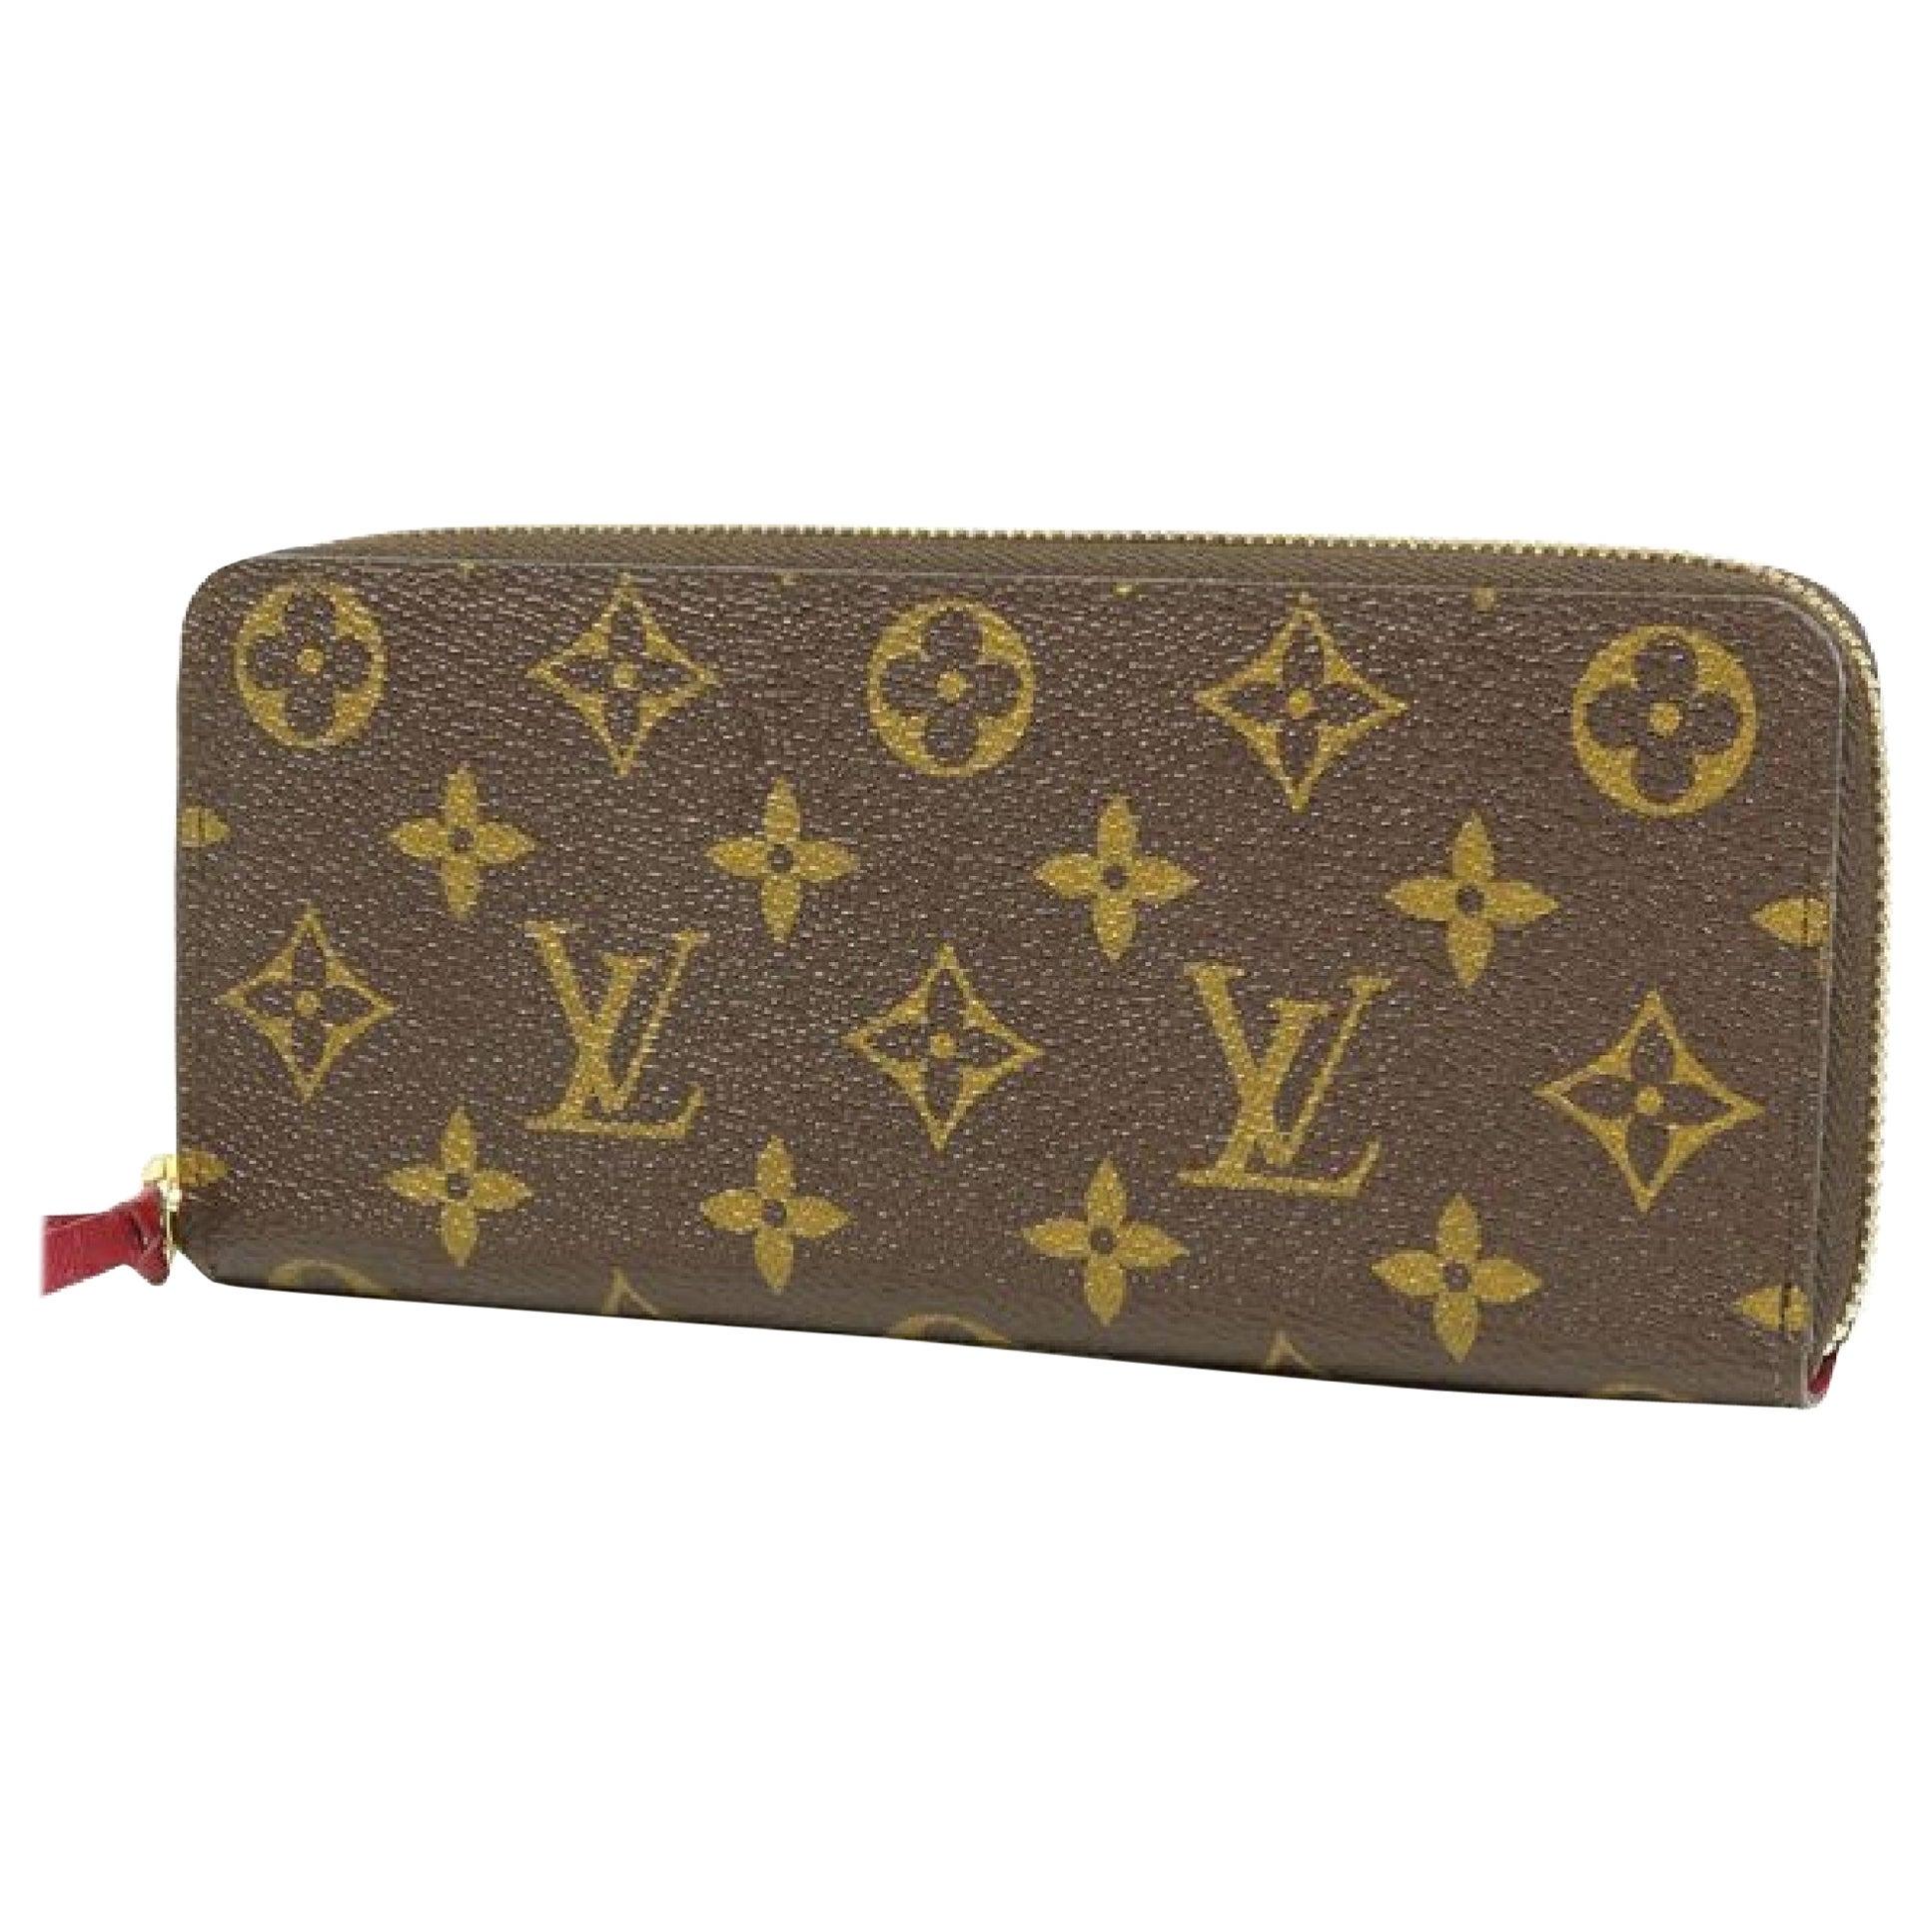 LOUIS VUITTON portofeuilles Clemence Womens long wallet M60742 Fuschia